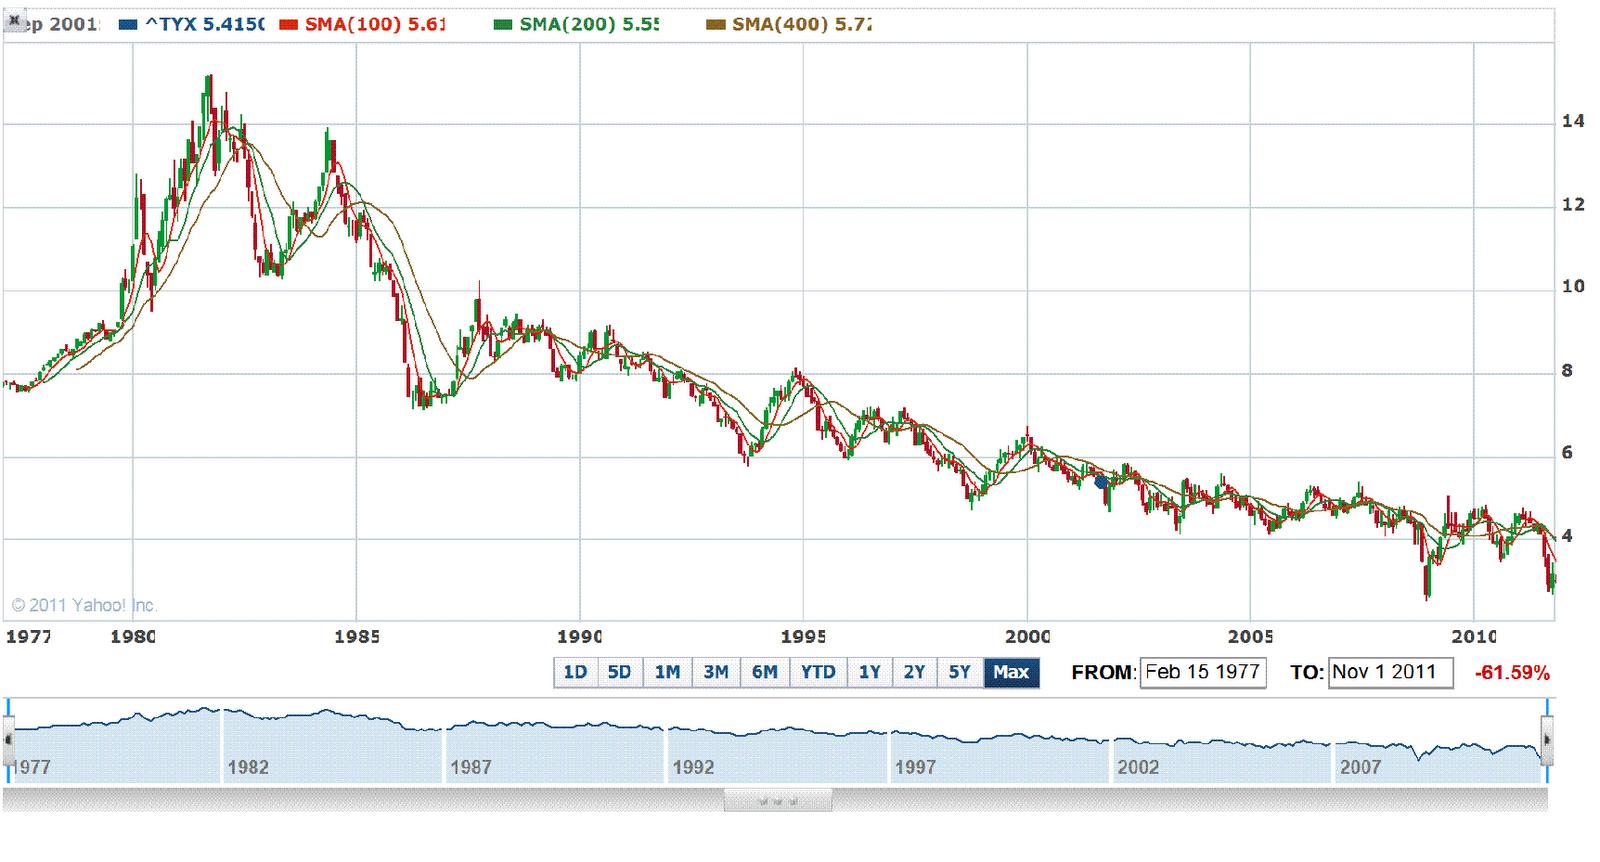 Us 30 year treasury bond yield revisiting its 2008 low nexttrade